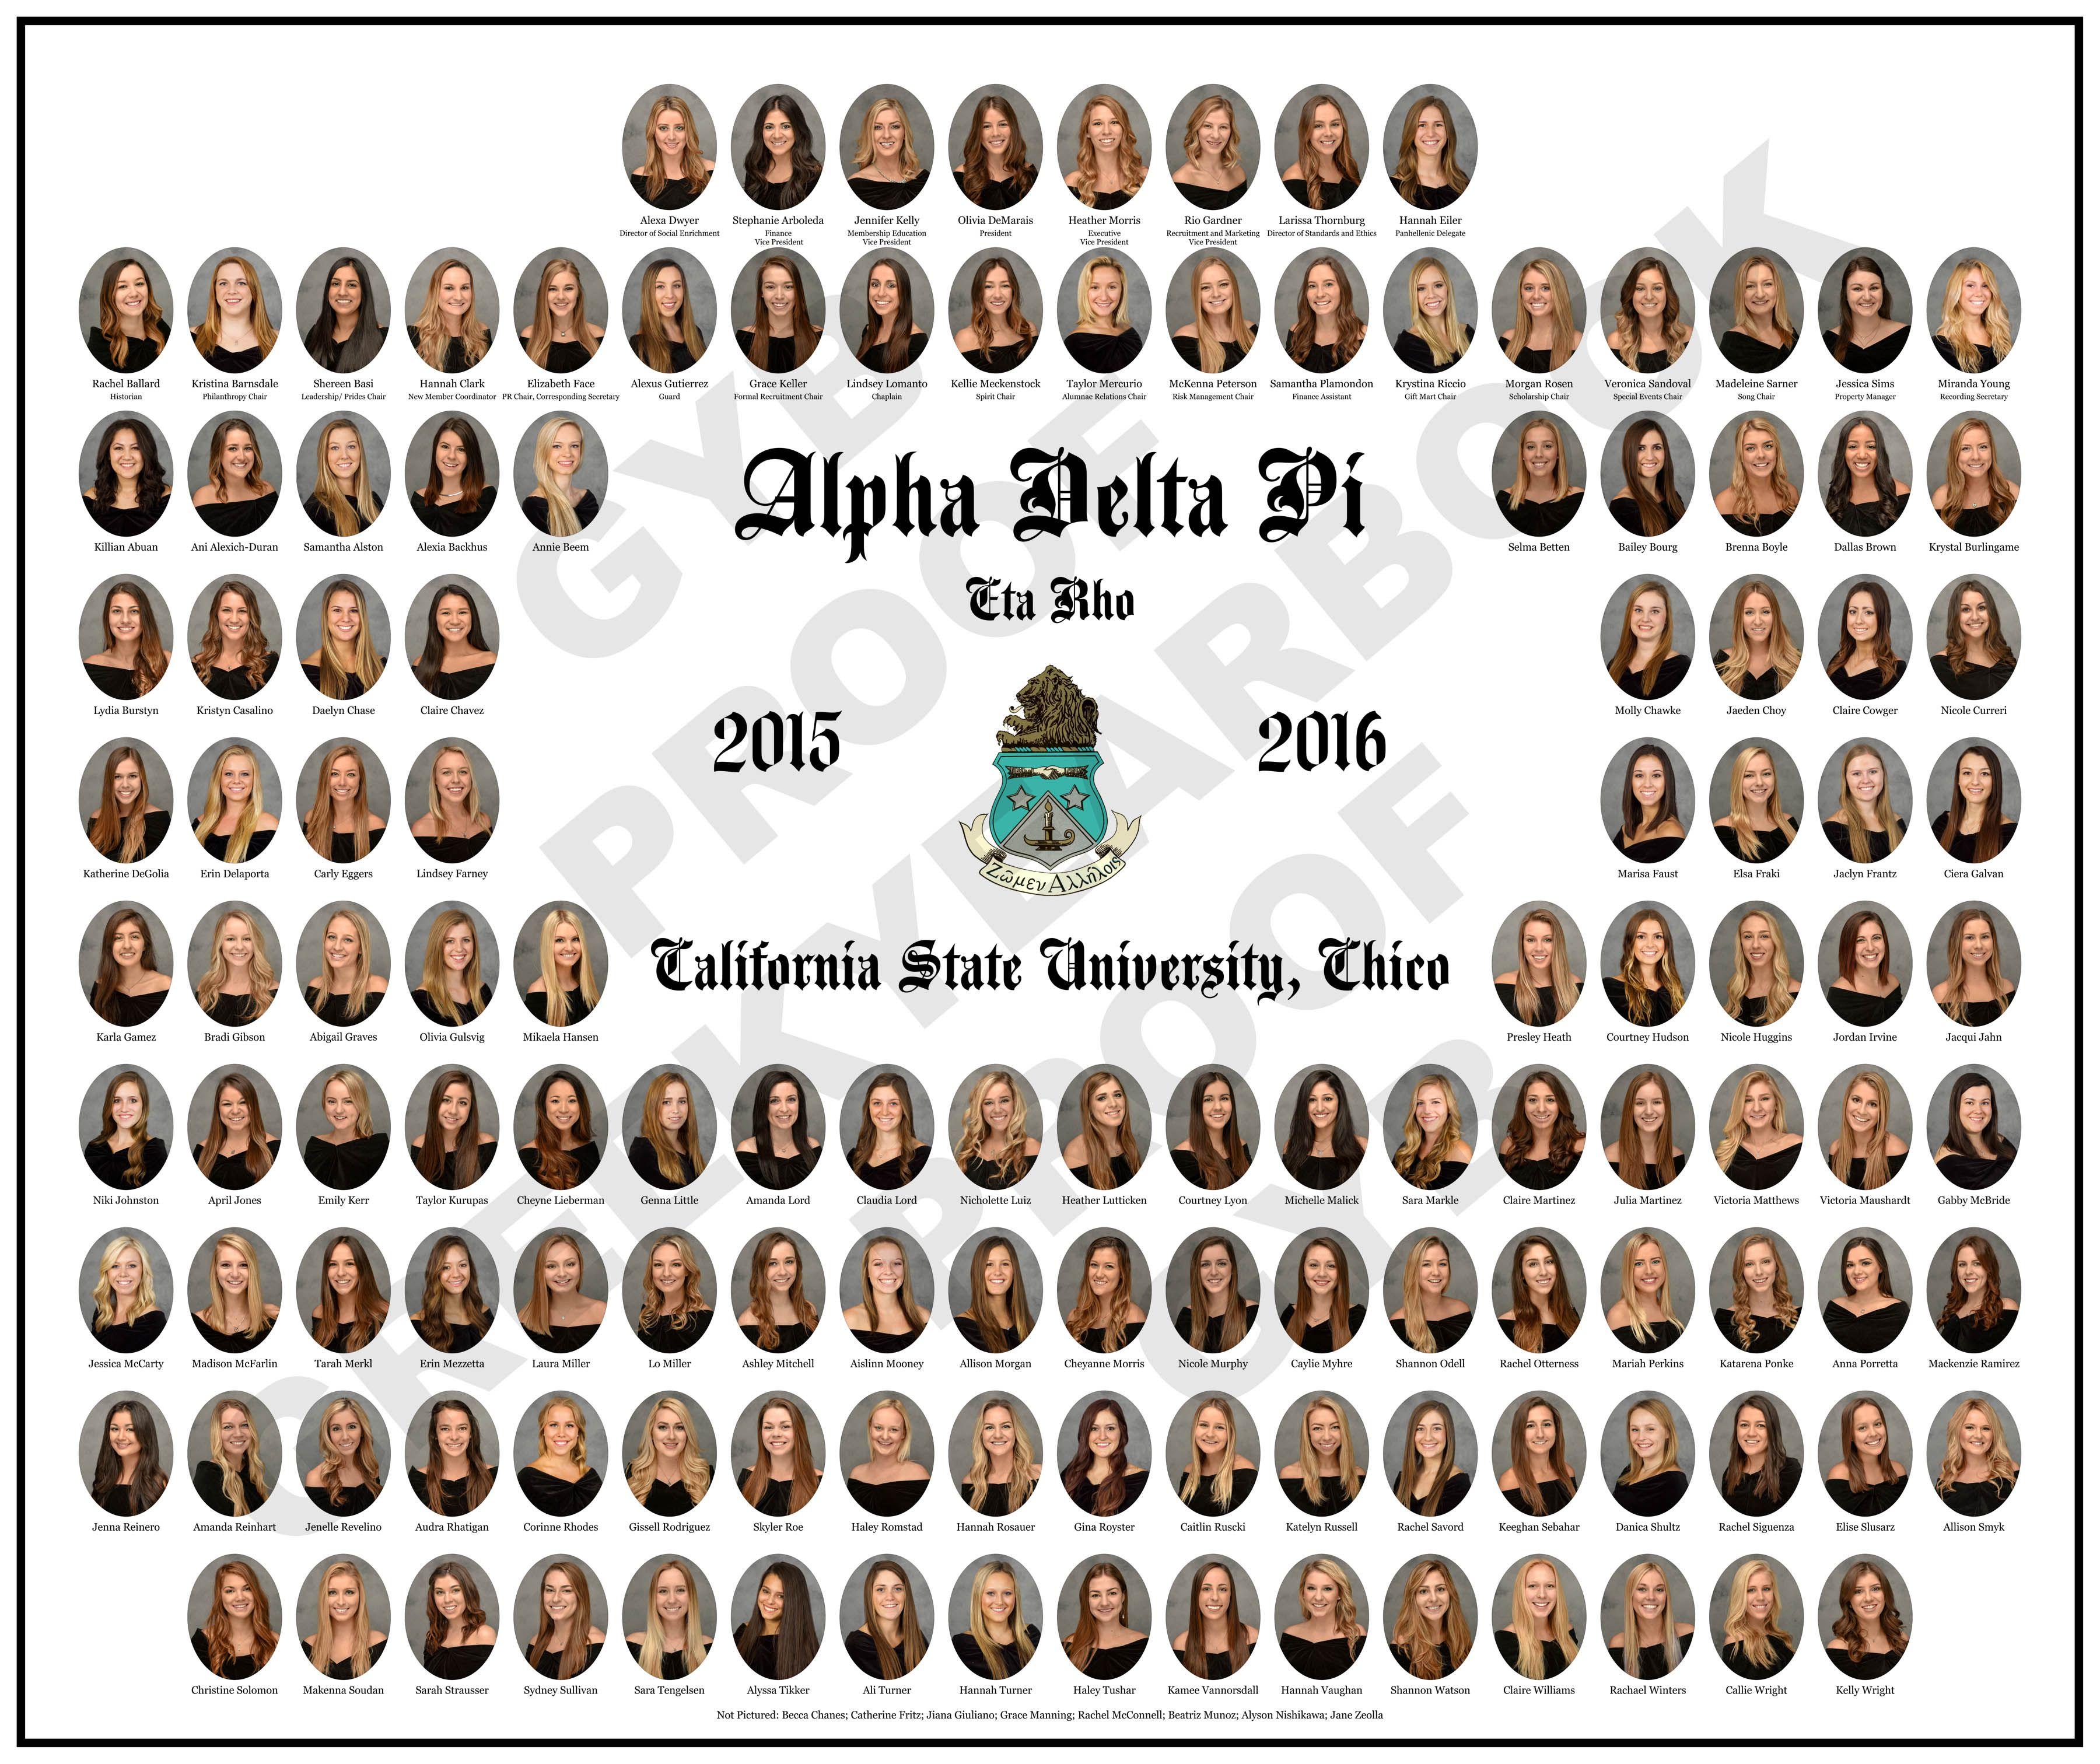 CSU Chico Alpha Delta Pi | GYB Composites & Portraits | Pinterest ...